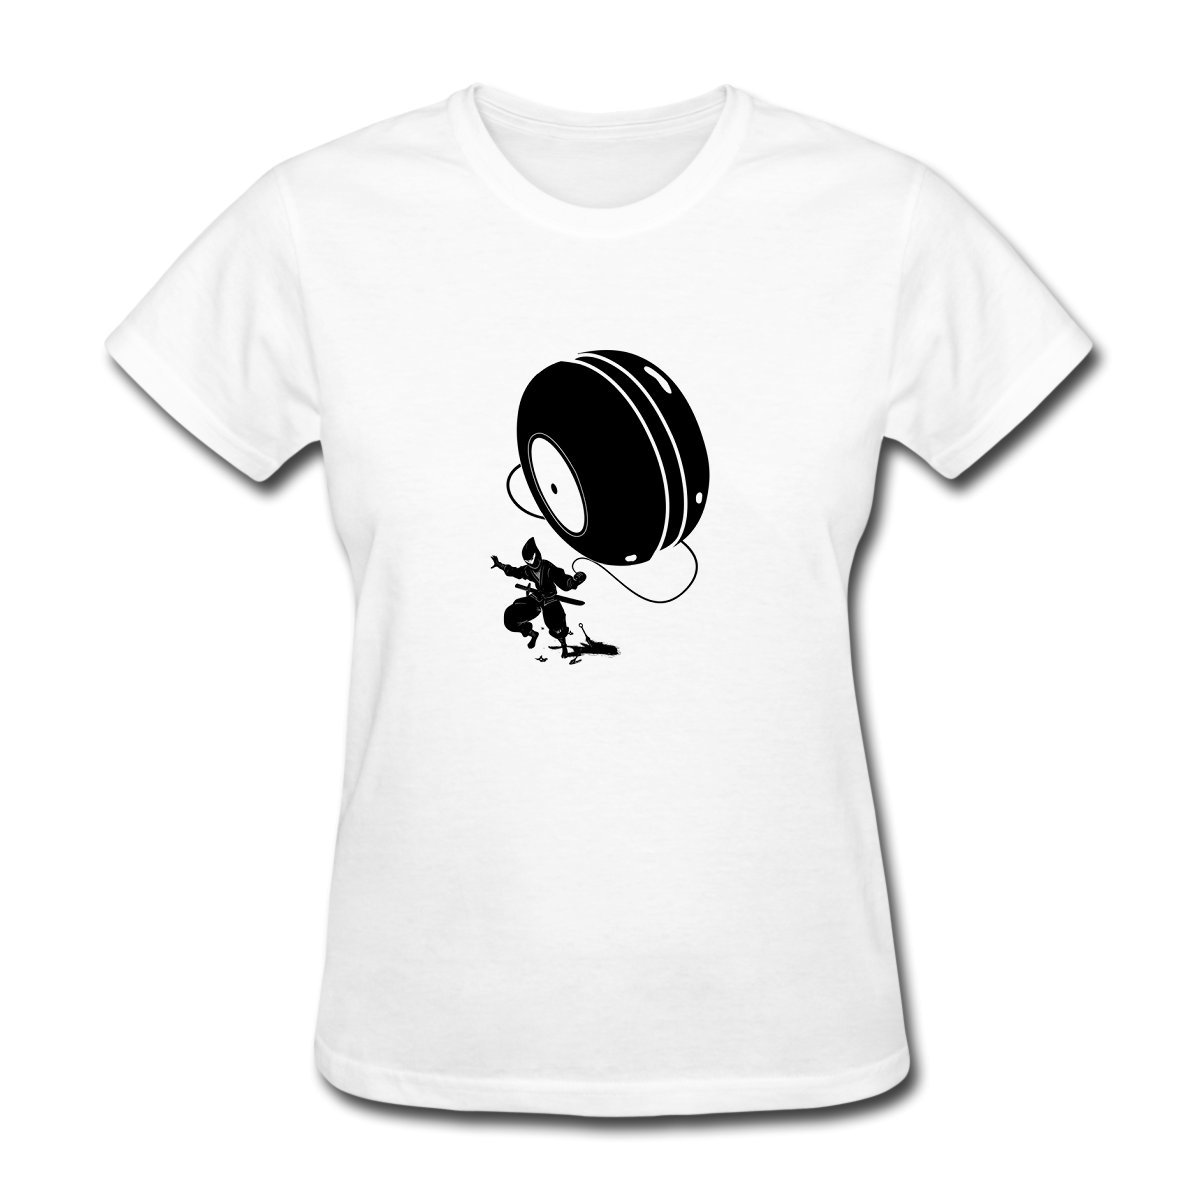 Amazon.com: Pookeng Ninja YOYO Womens Funny Short Sleeve T ...